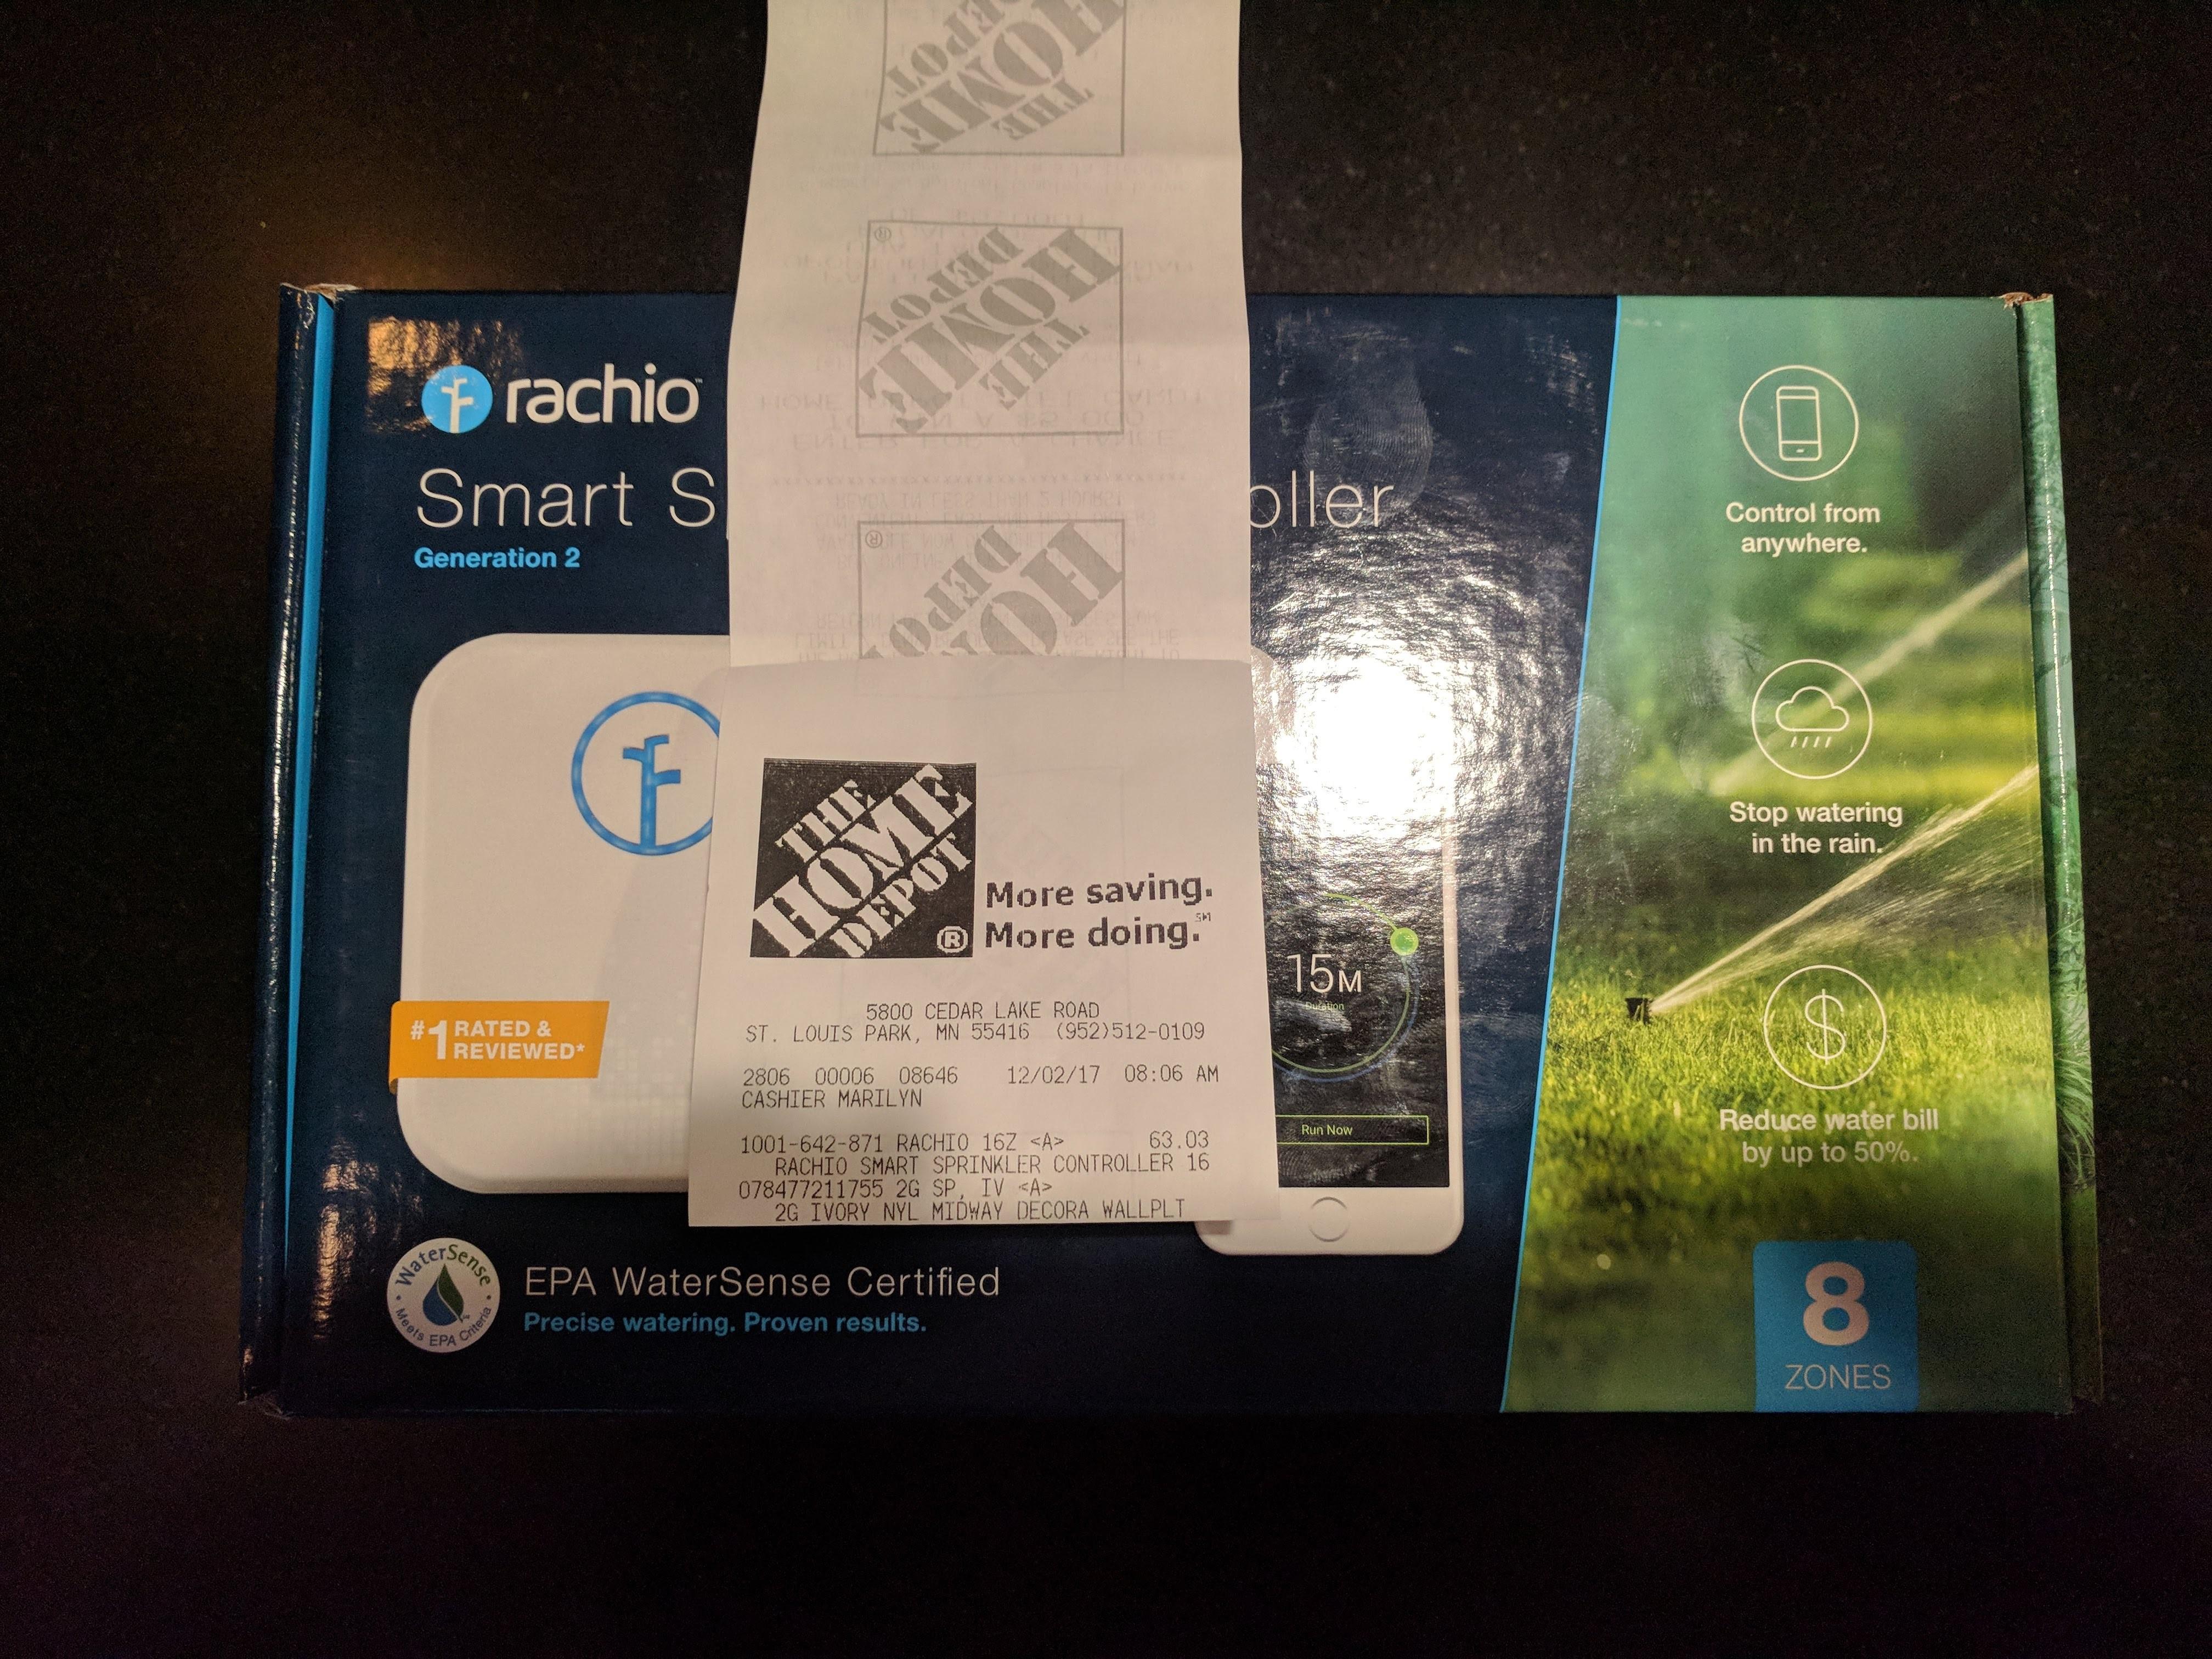 Rachio 2nd generation 8 Zone Wifi smart sprinkler controller